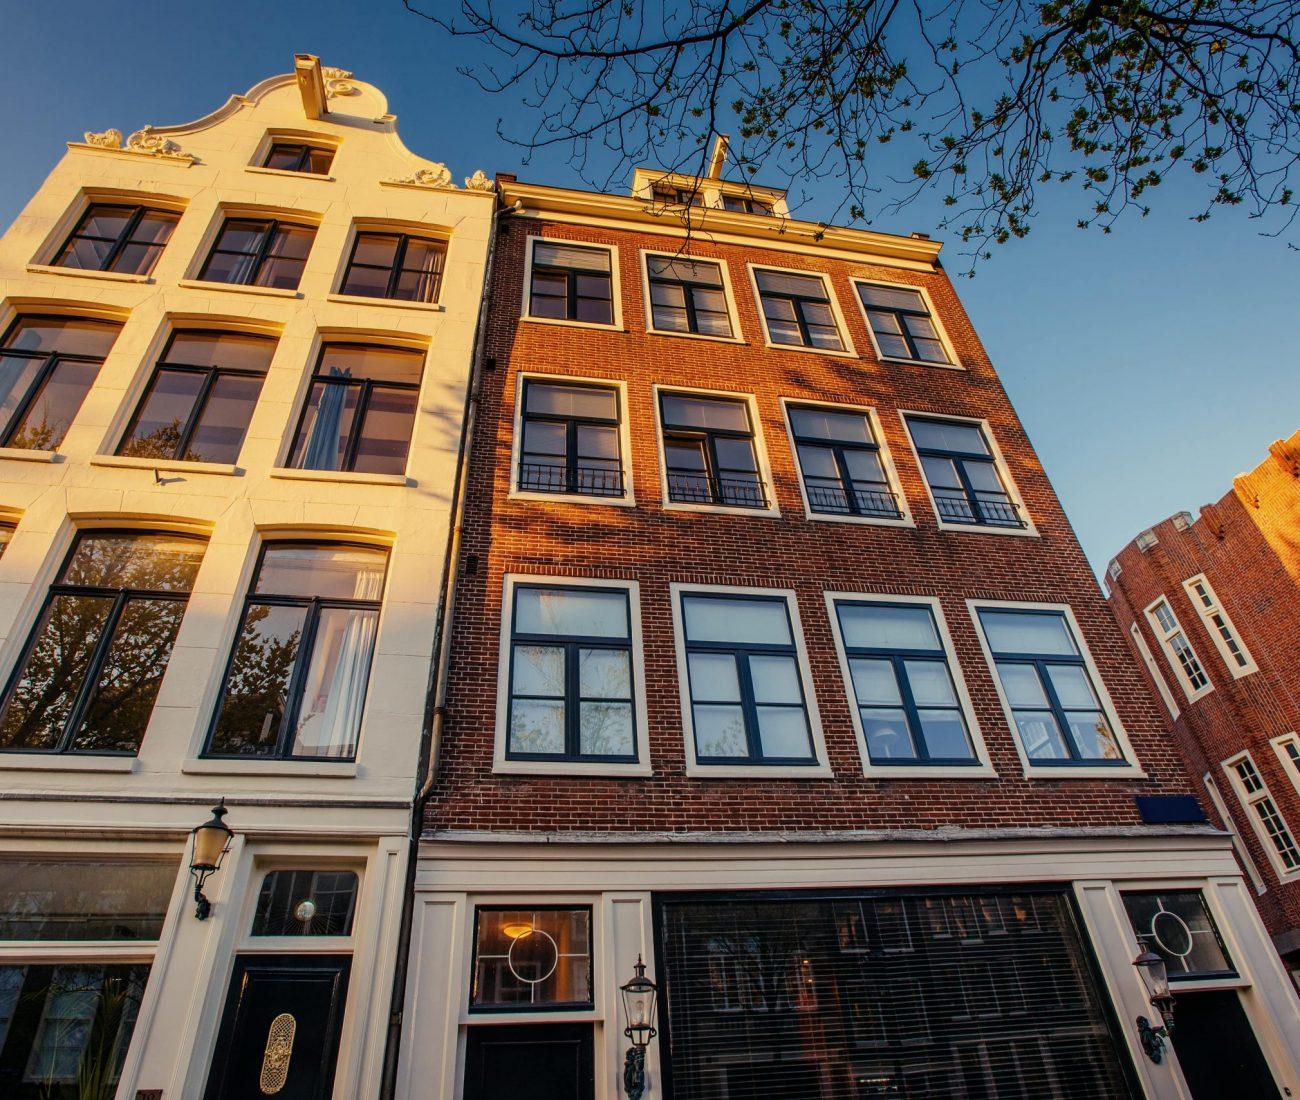 woning-in-amsterdam